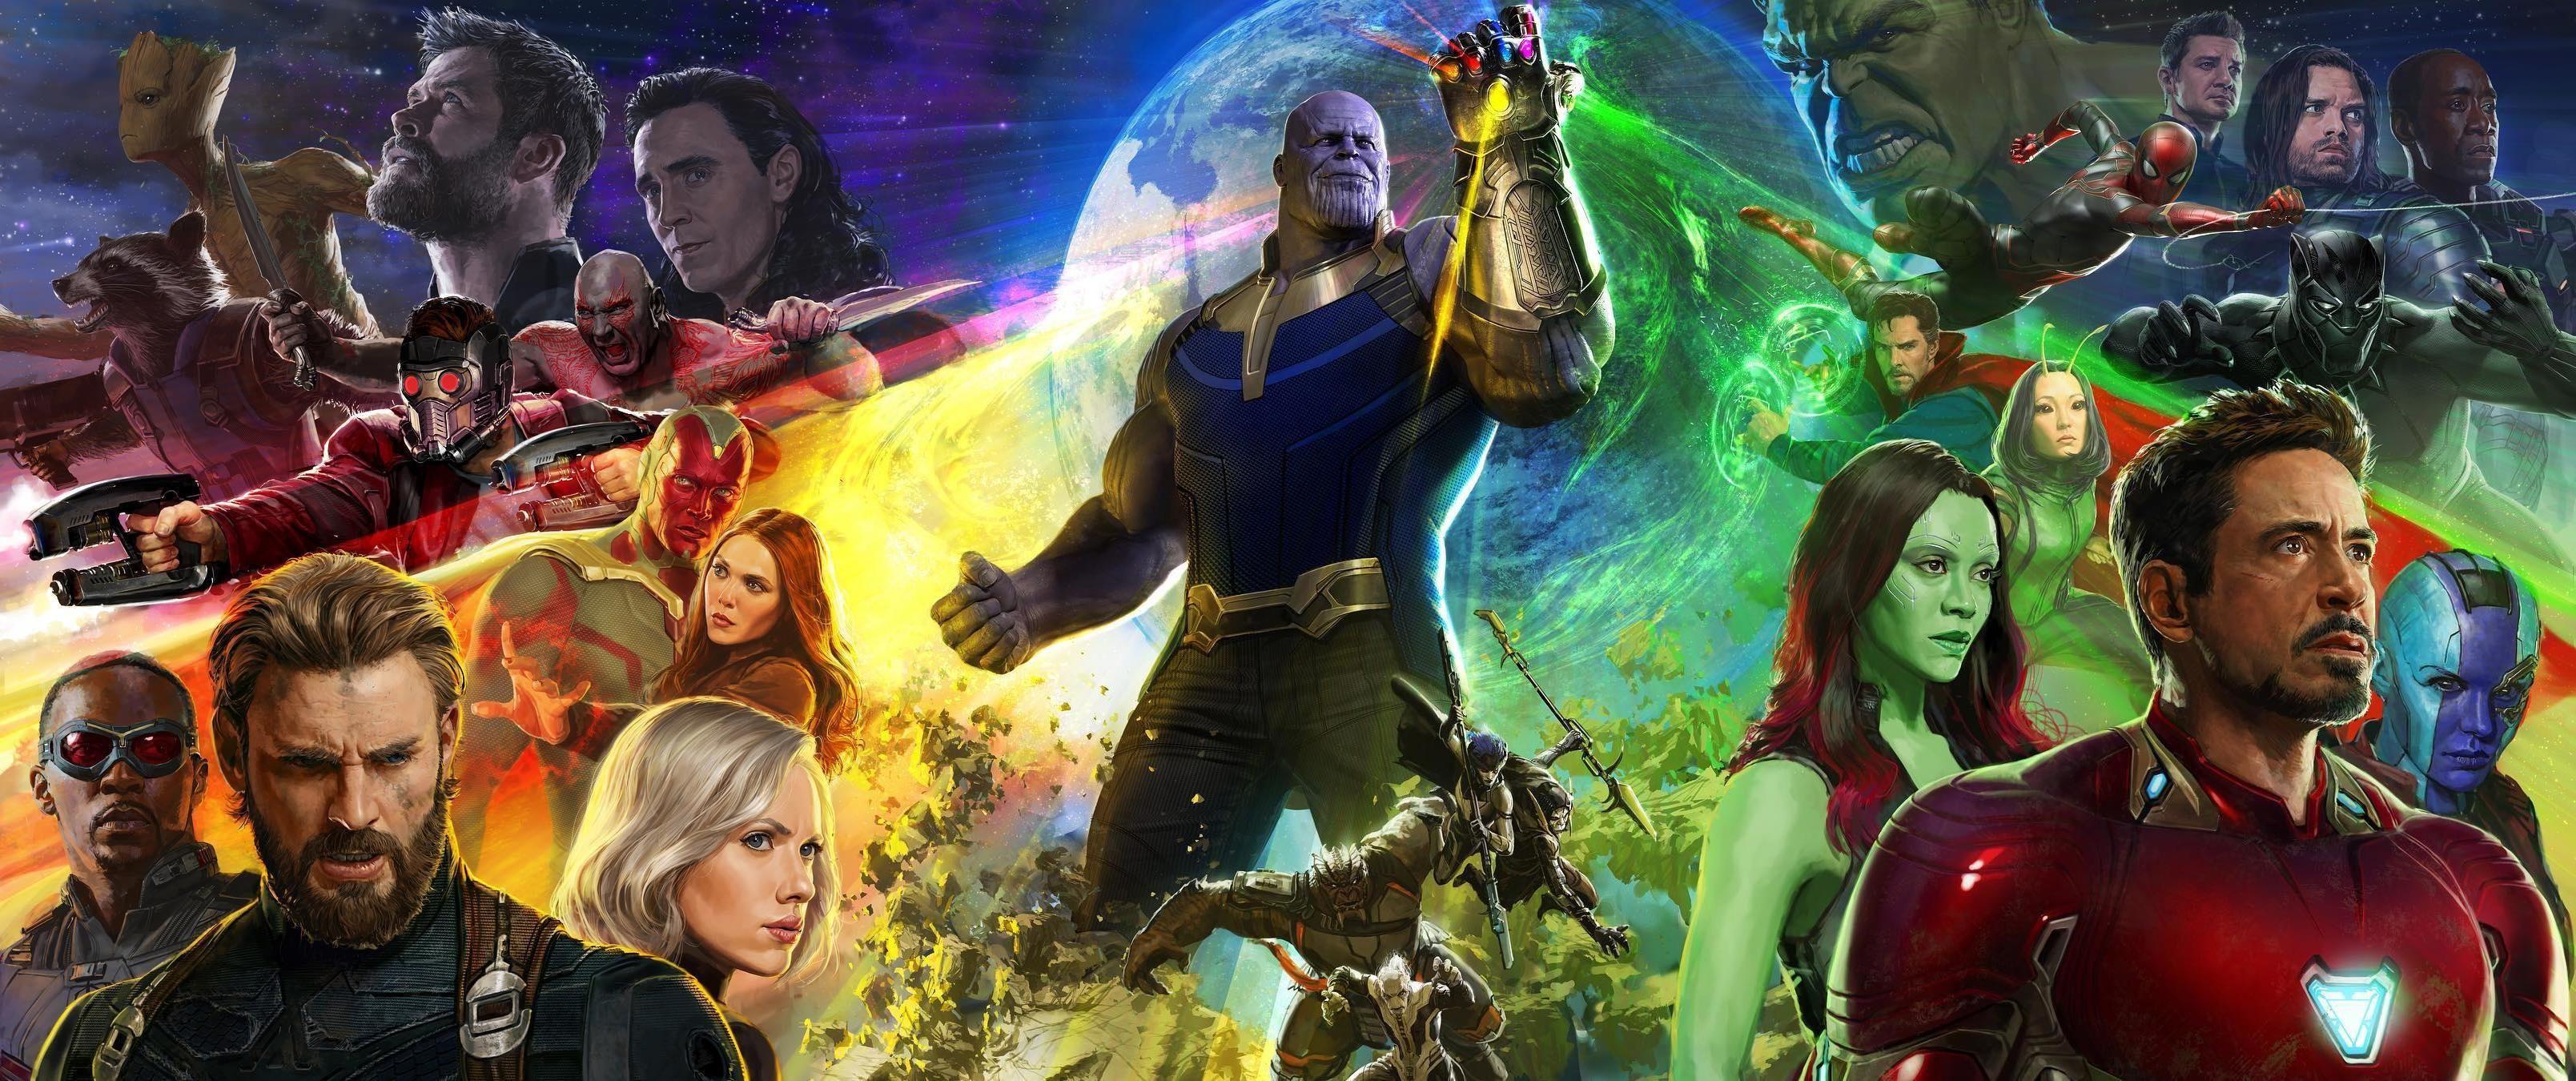 Avengers Infinity War Poster full HD | Héros marvel, Infinity war, Fond d'écran avengers